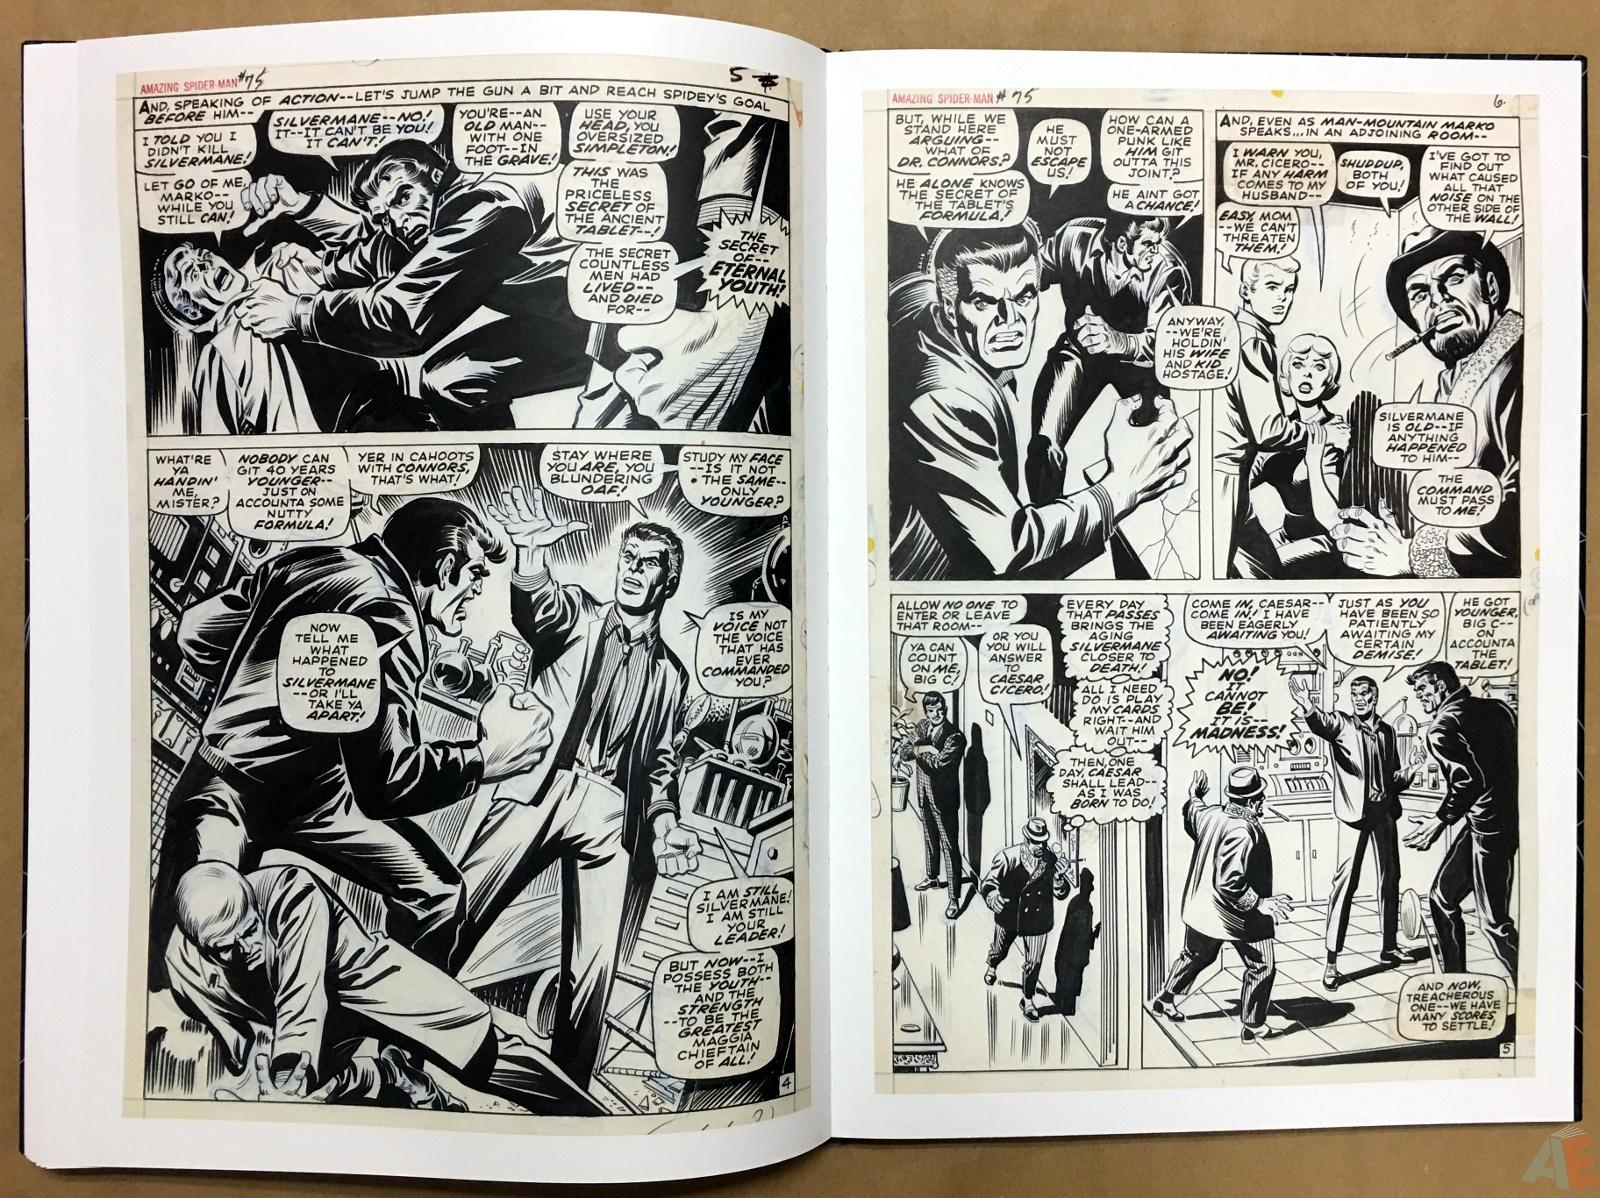 John Romita's The Amazing Spider-Man Artist's Edition 38